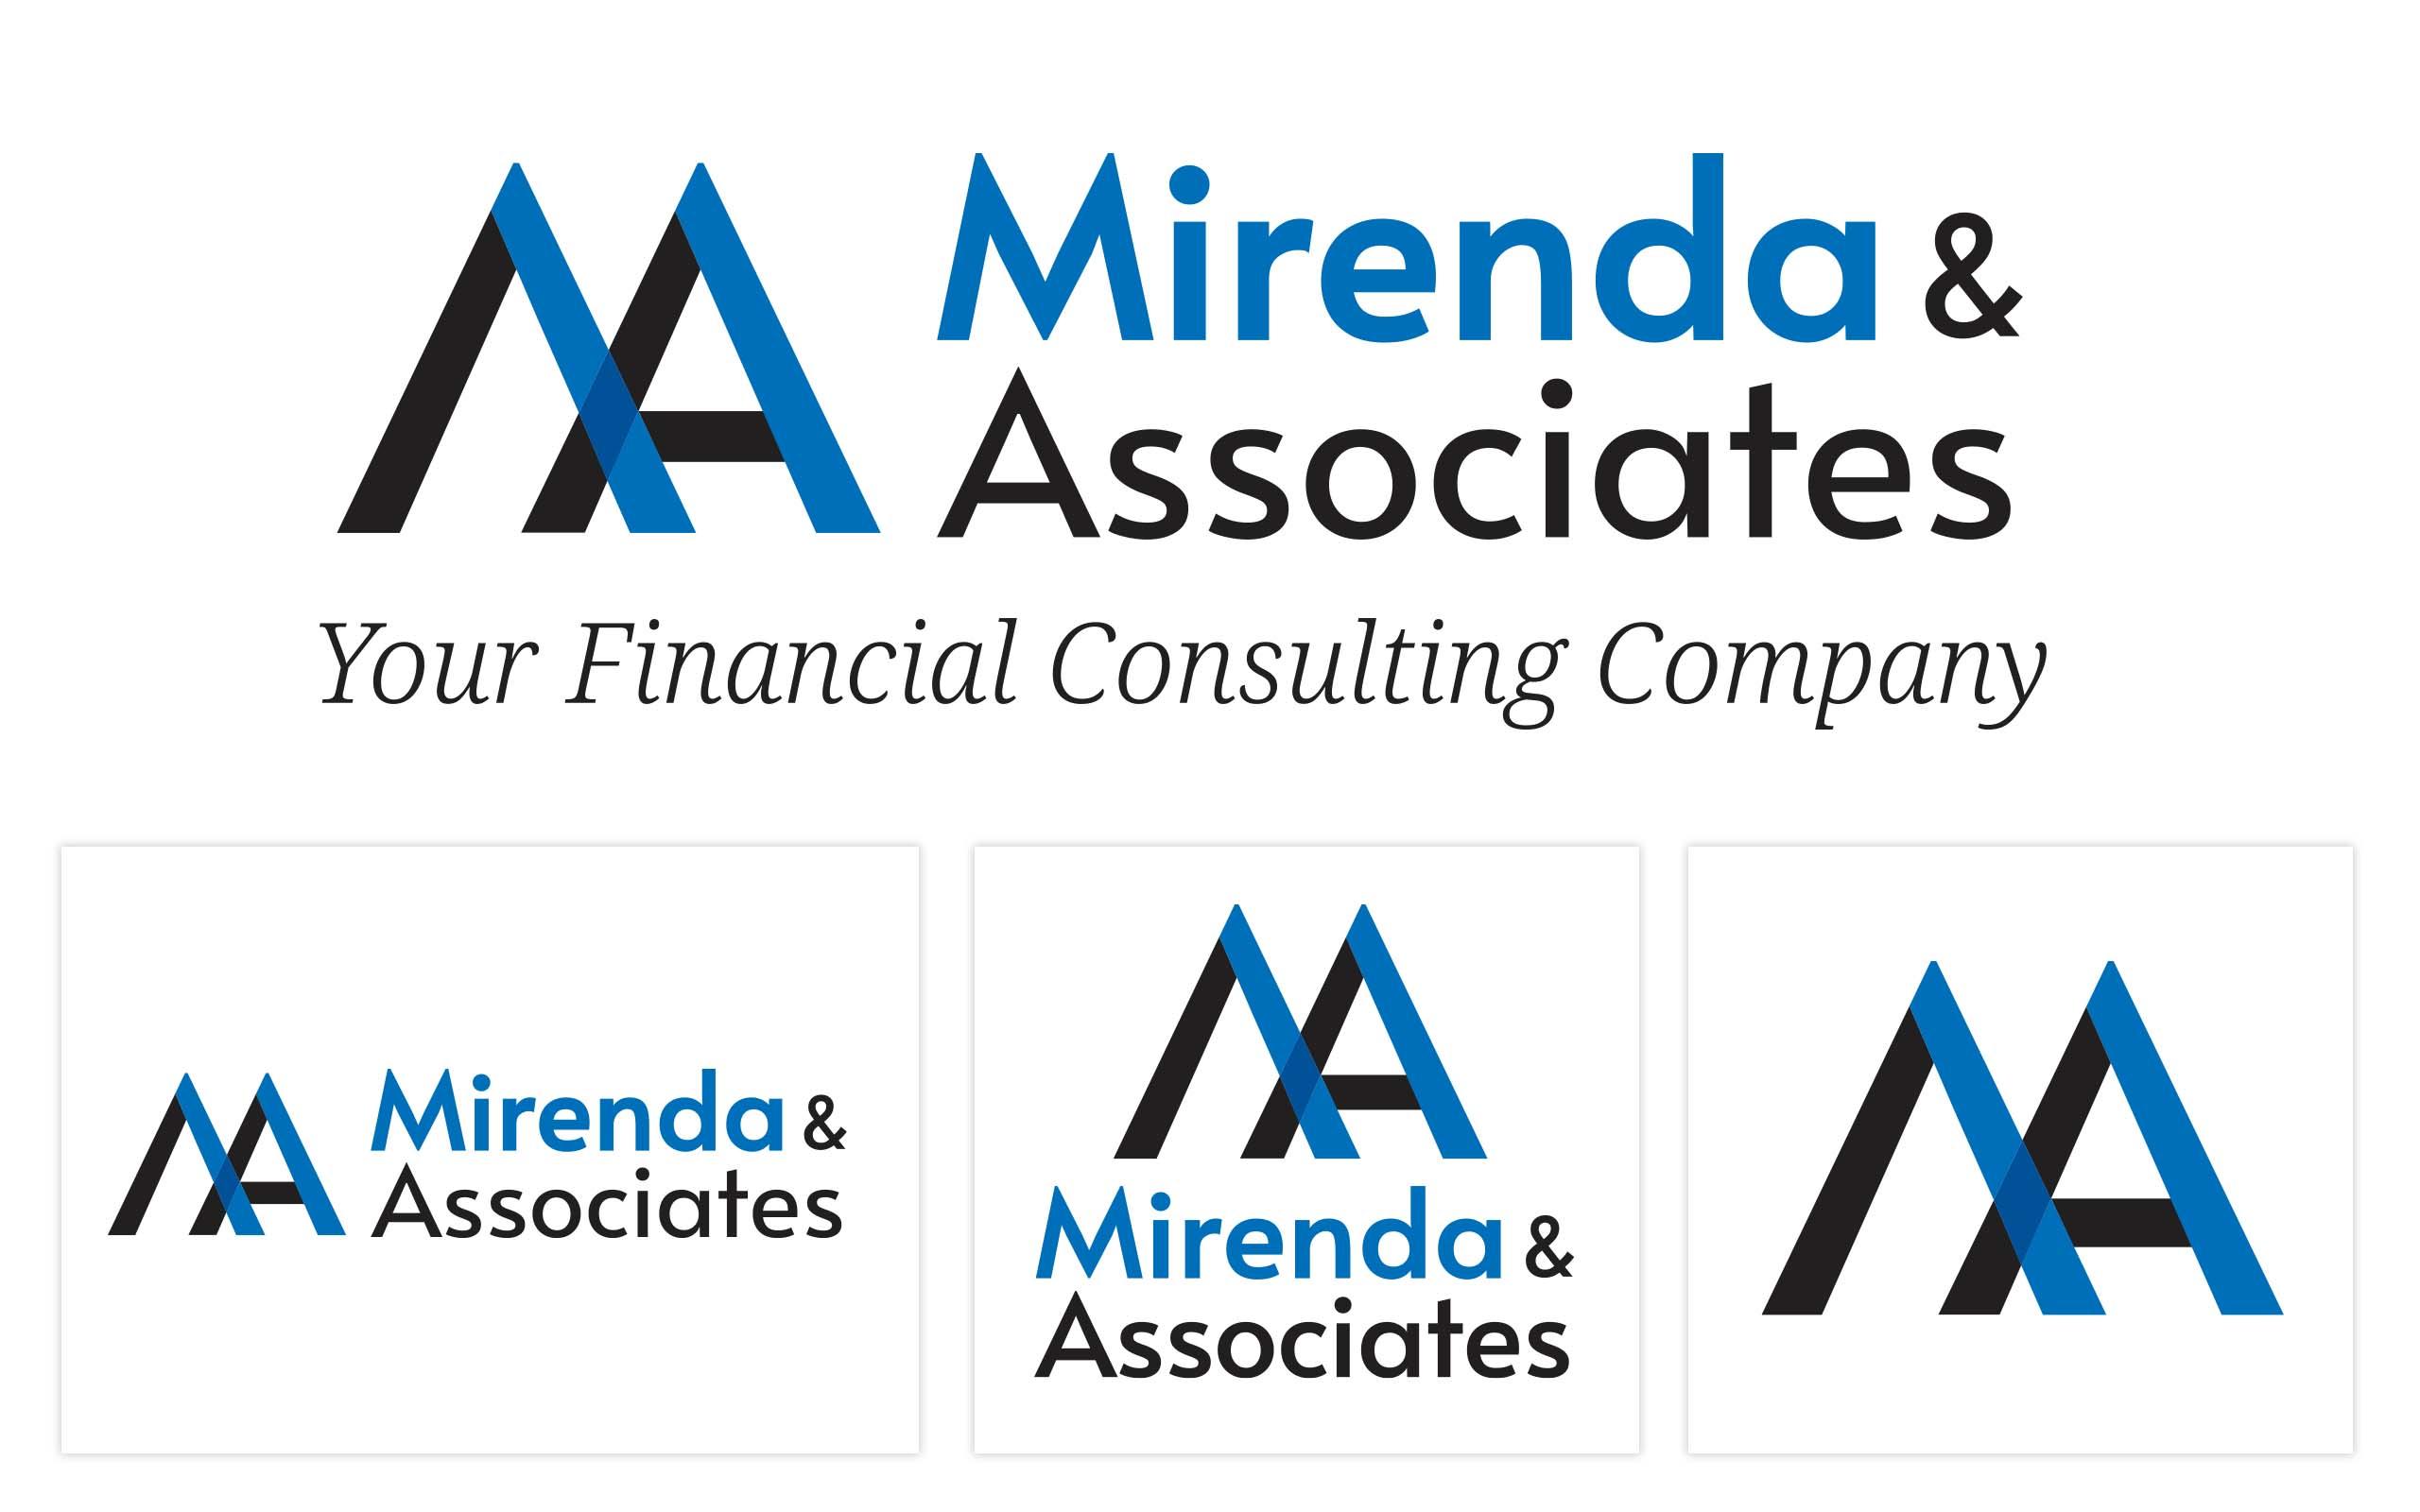 Mirenda & Associates Branding